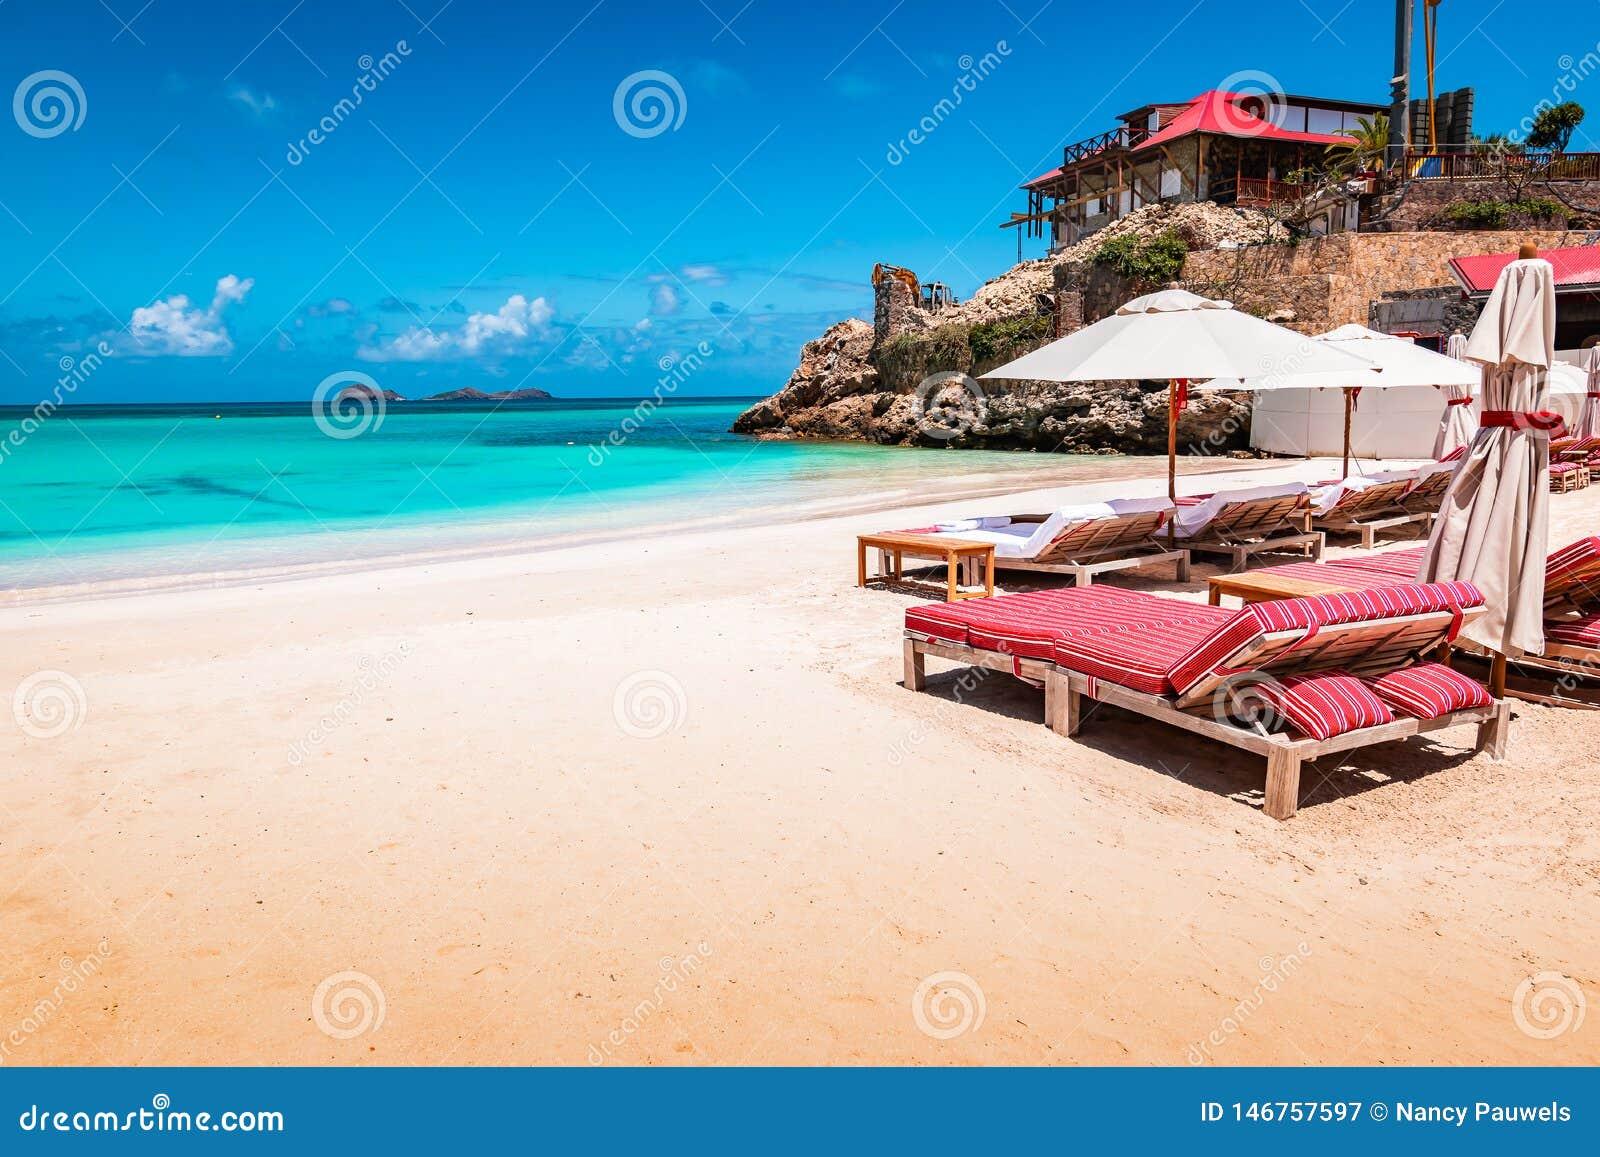 Cadeiras e guarda-chuva luxuosos de praia na praia exótica em St Barths, ilha das Caraíbas